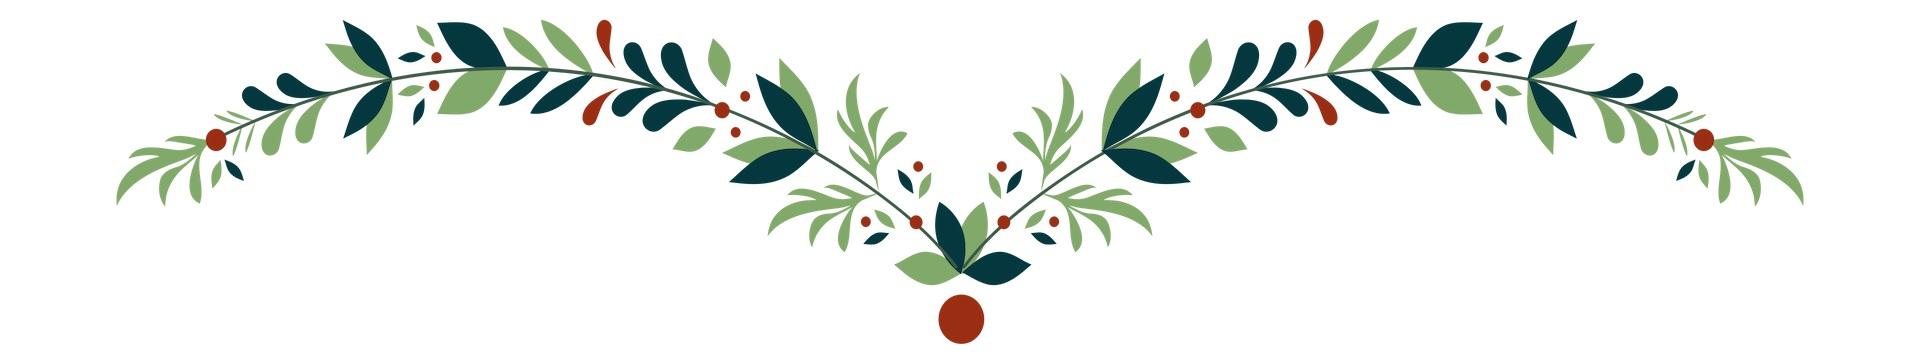 Christmas+Crossroads+Branding+%286%29.jpg